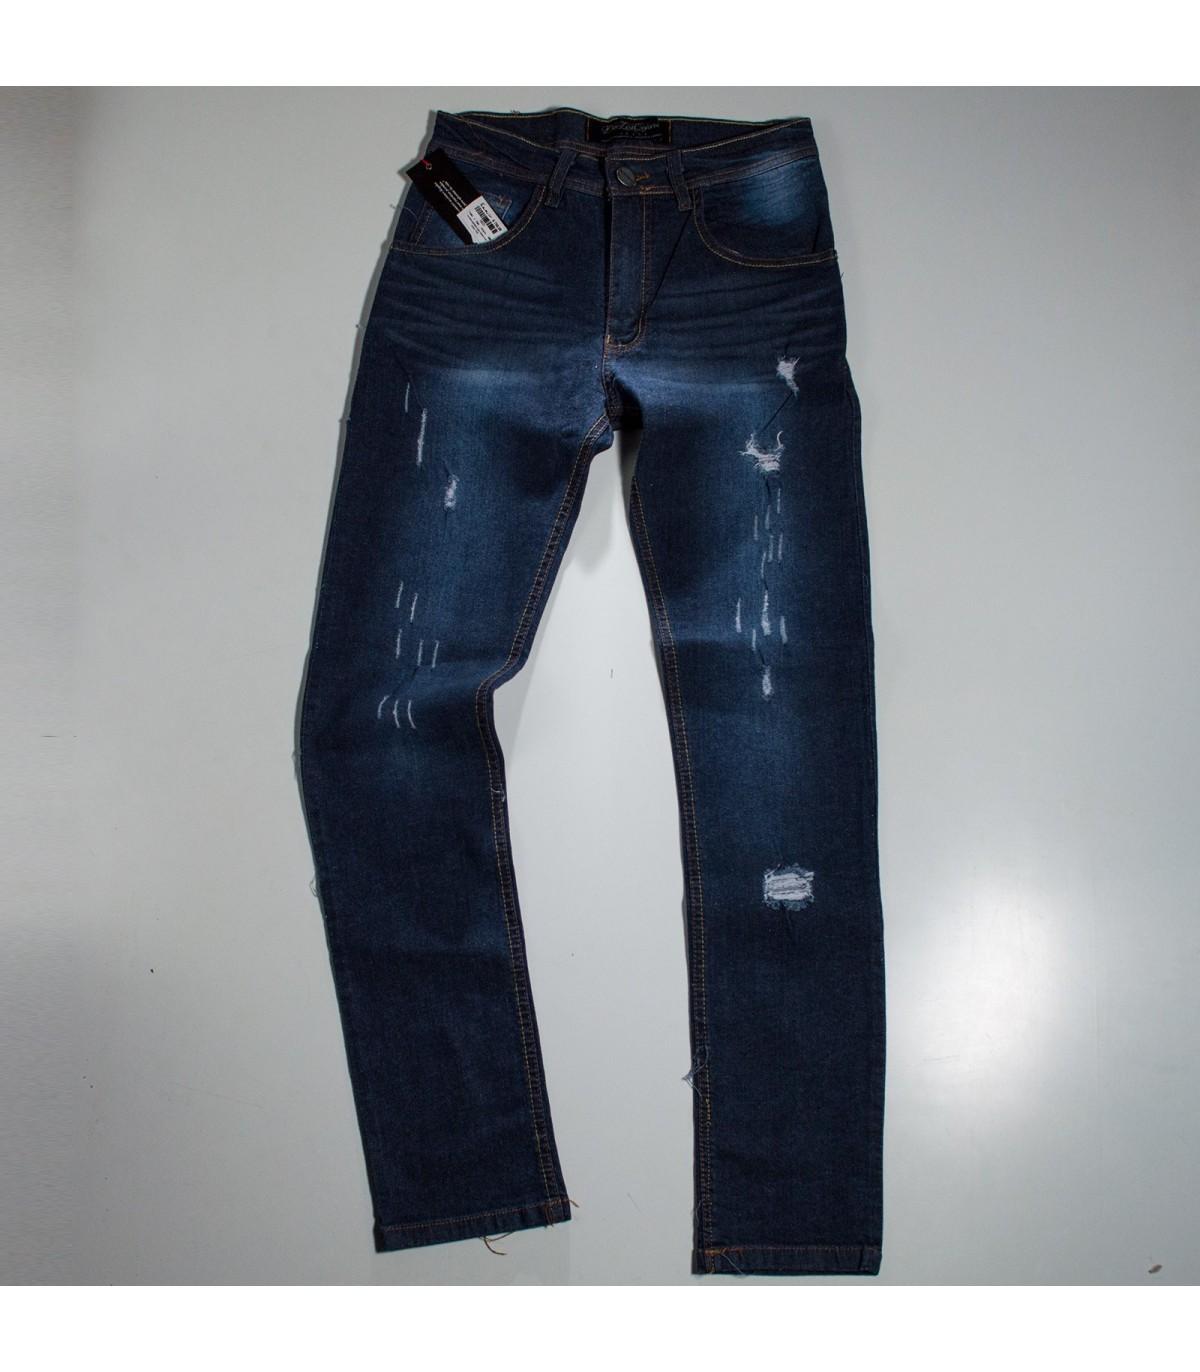 Caballeros Pantalones Primavera Verano